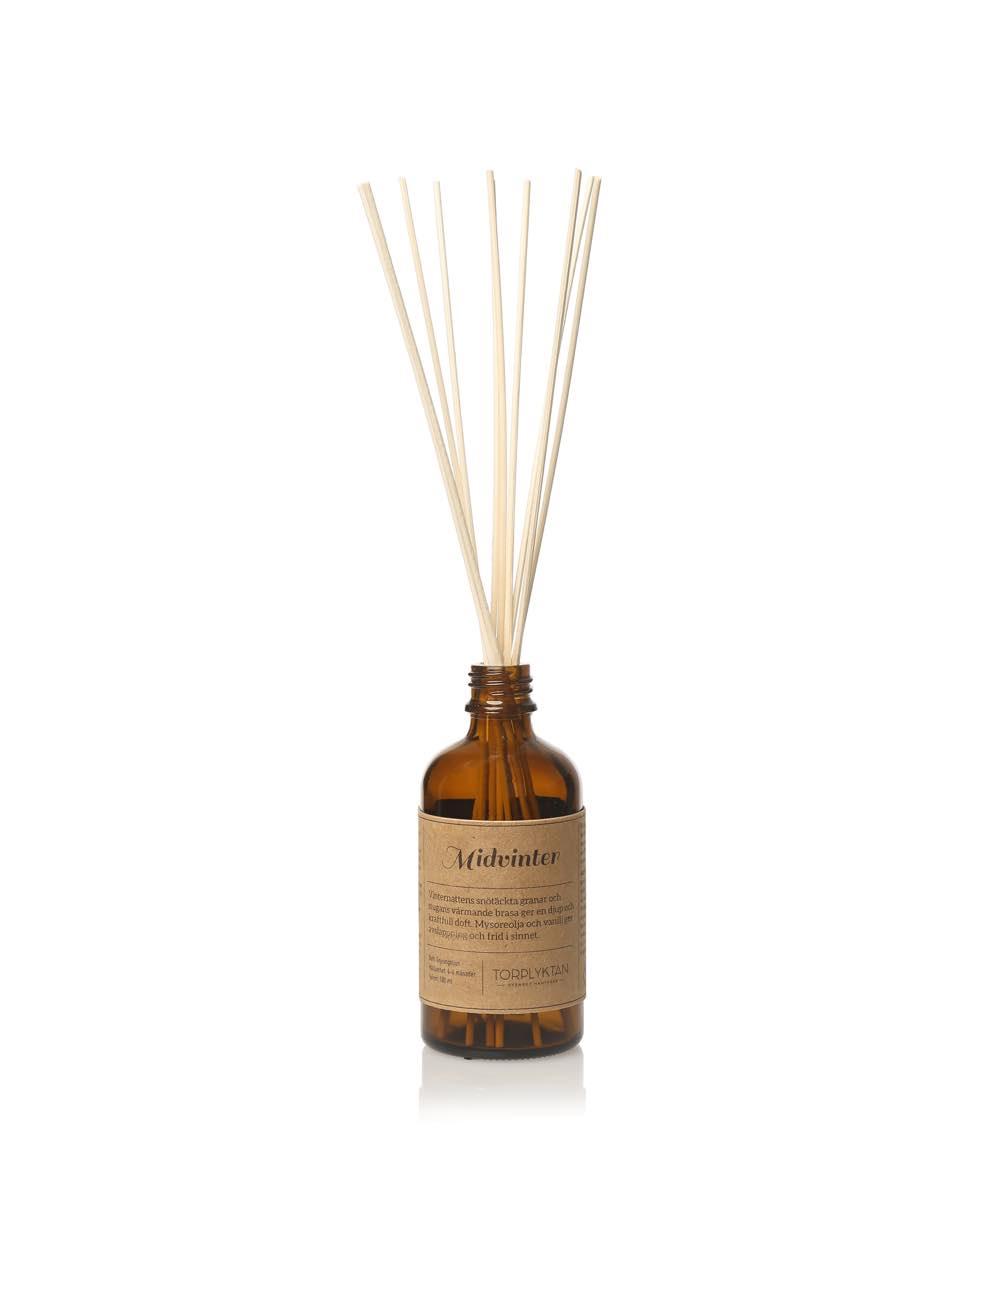 Midwinter Fragrance Sticks